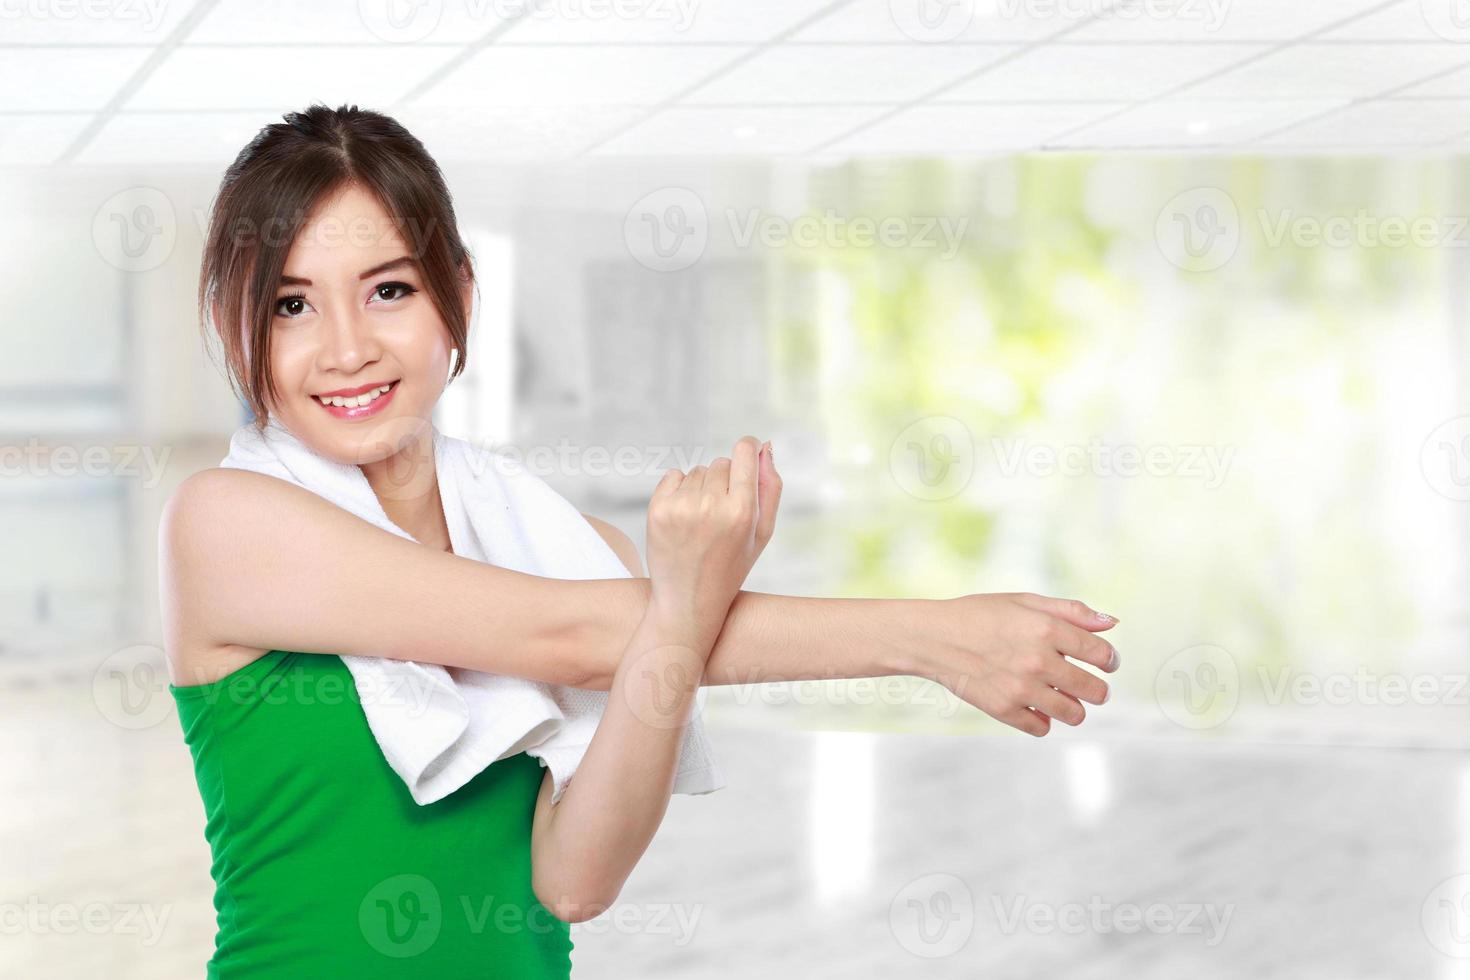 kvinna gör stretching på gymmet foto